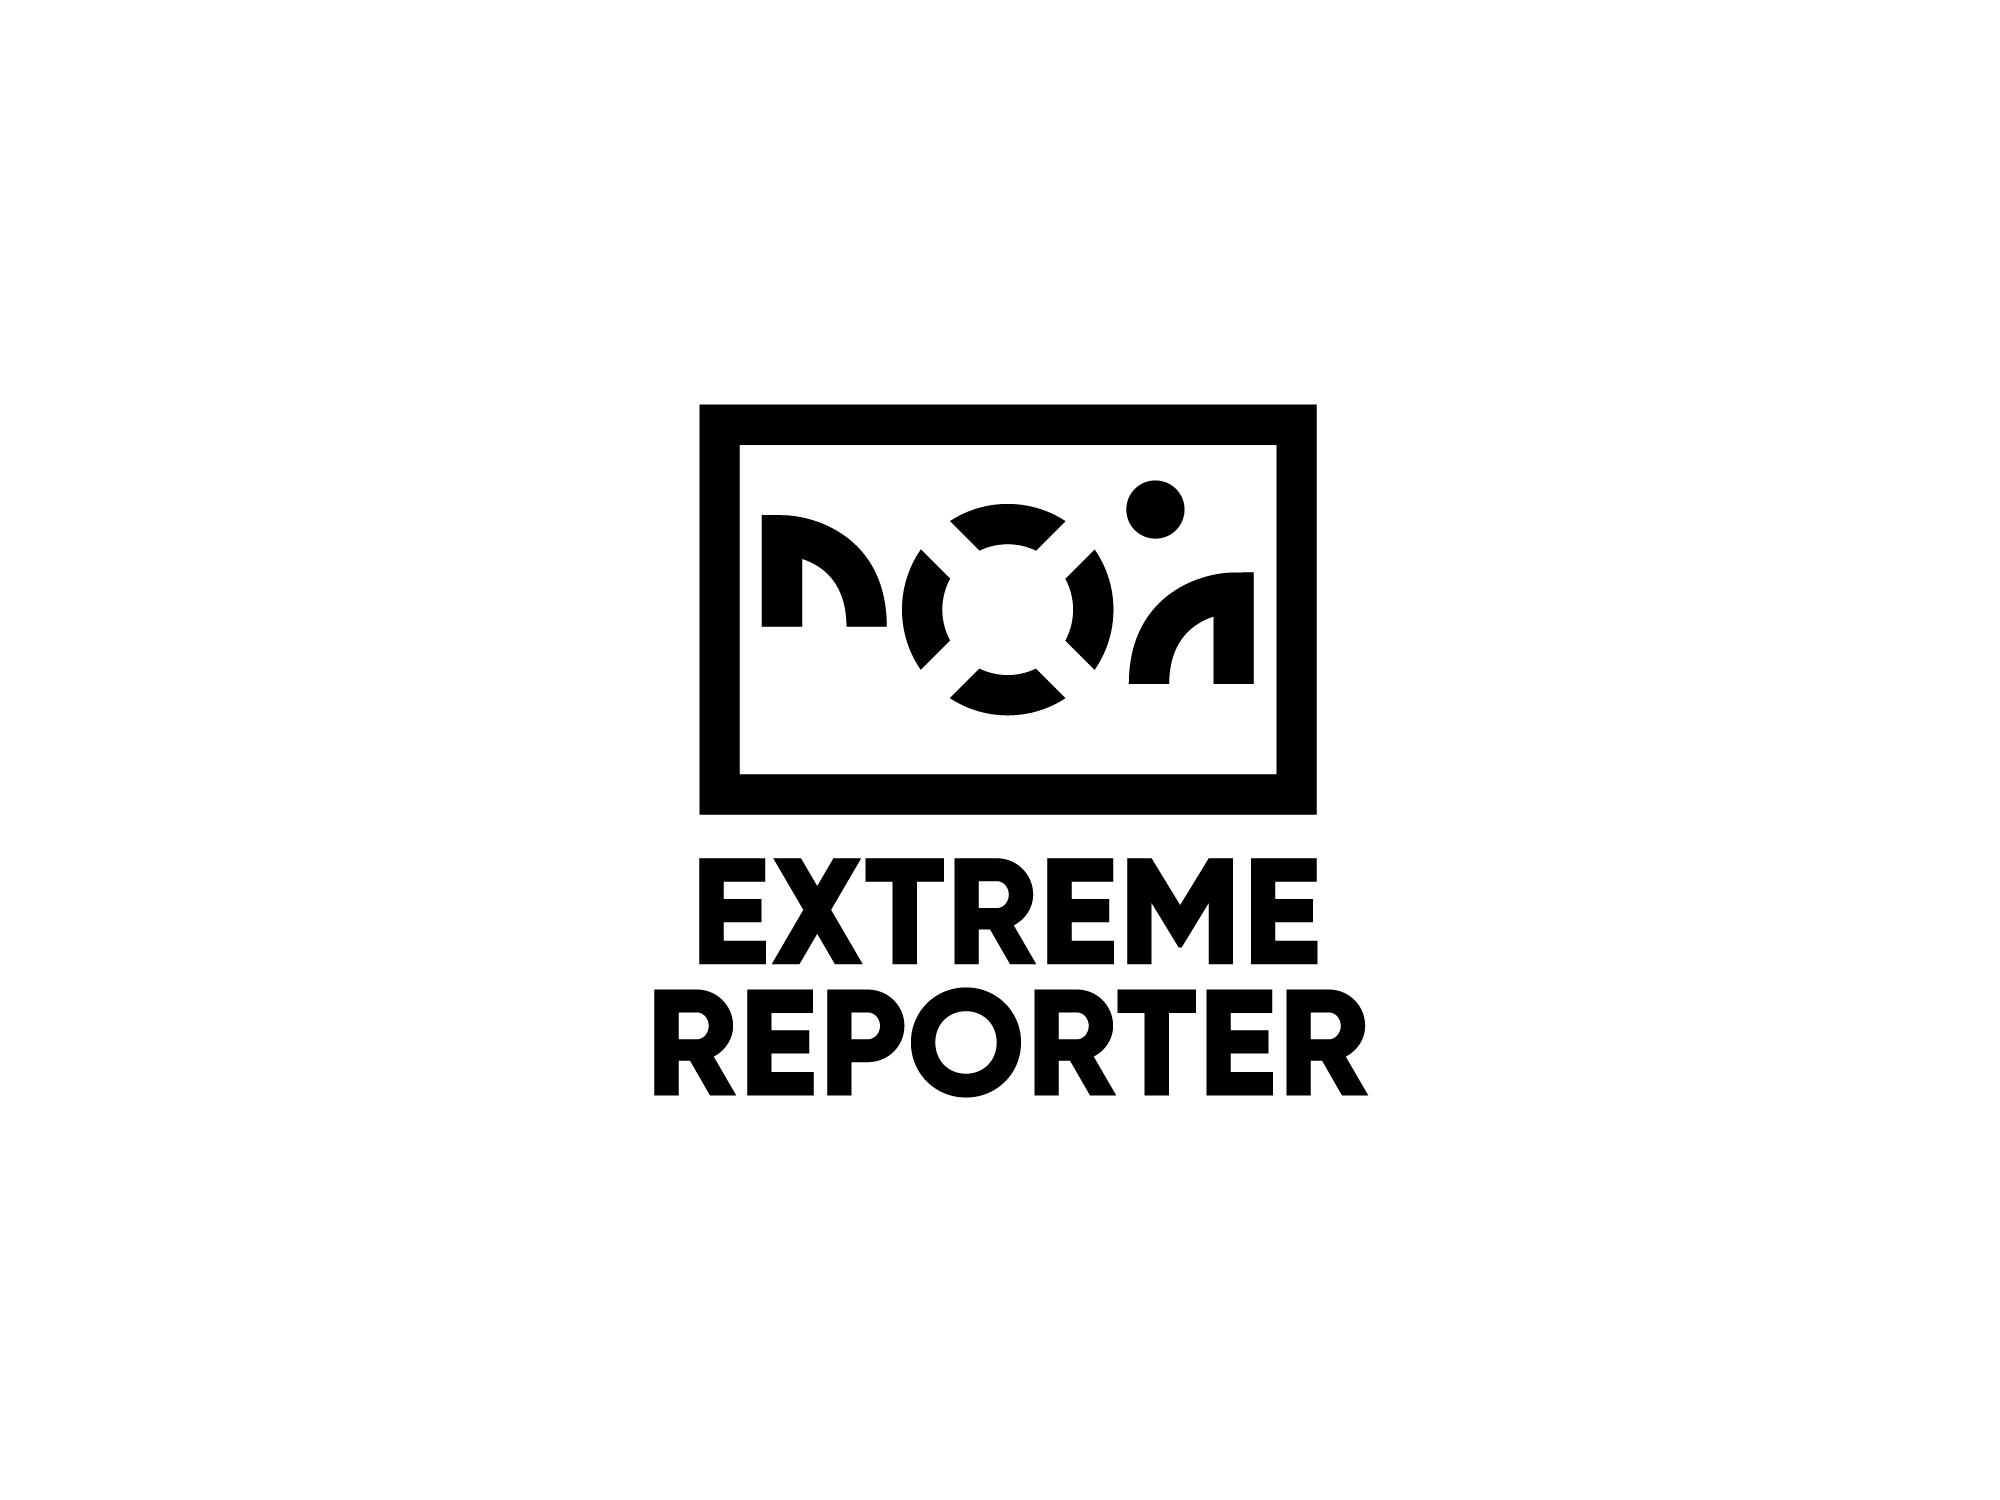 Логотип для экстрим фотографа.  фото f_2765a526912777f0.jpg